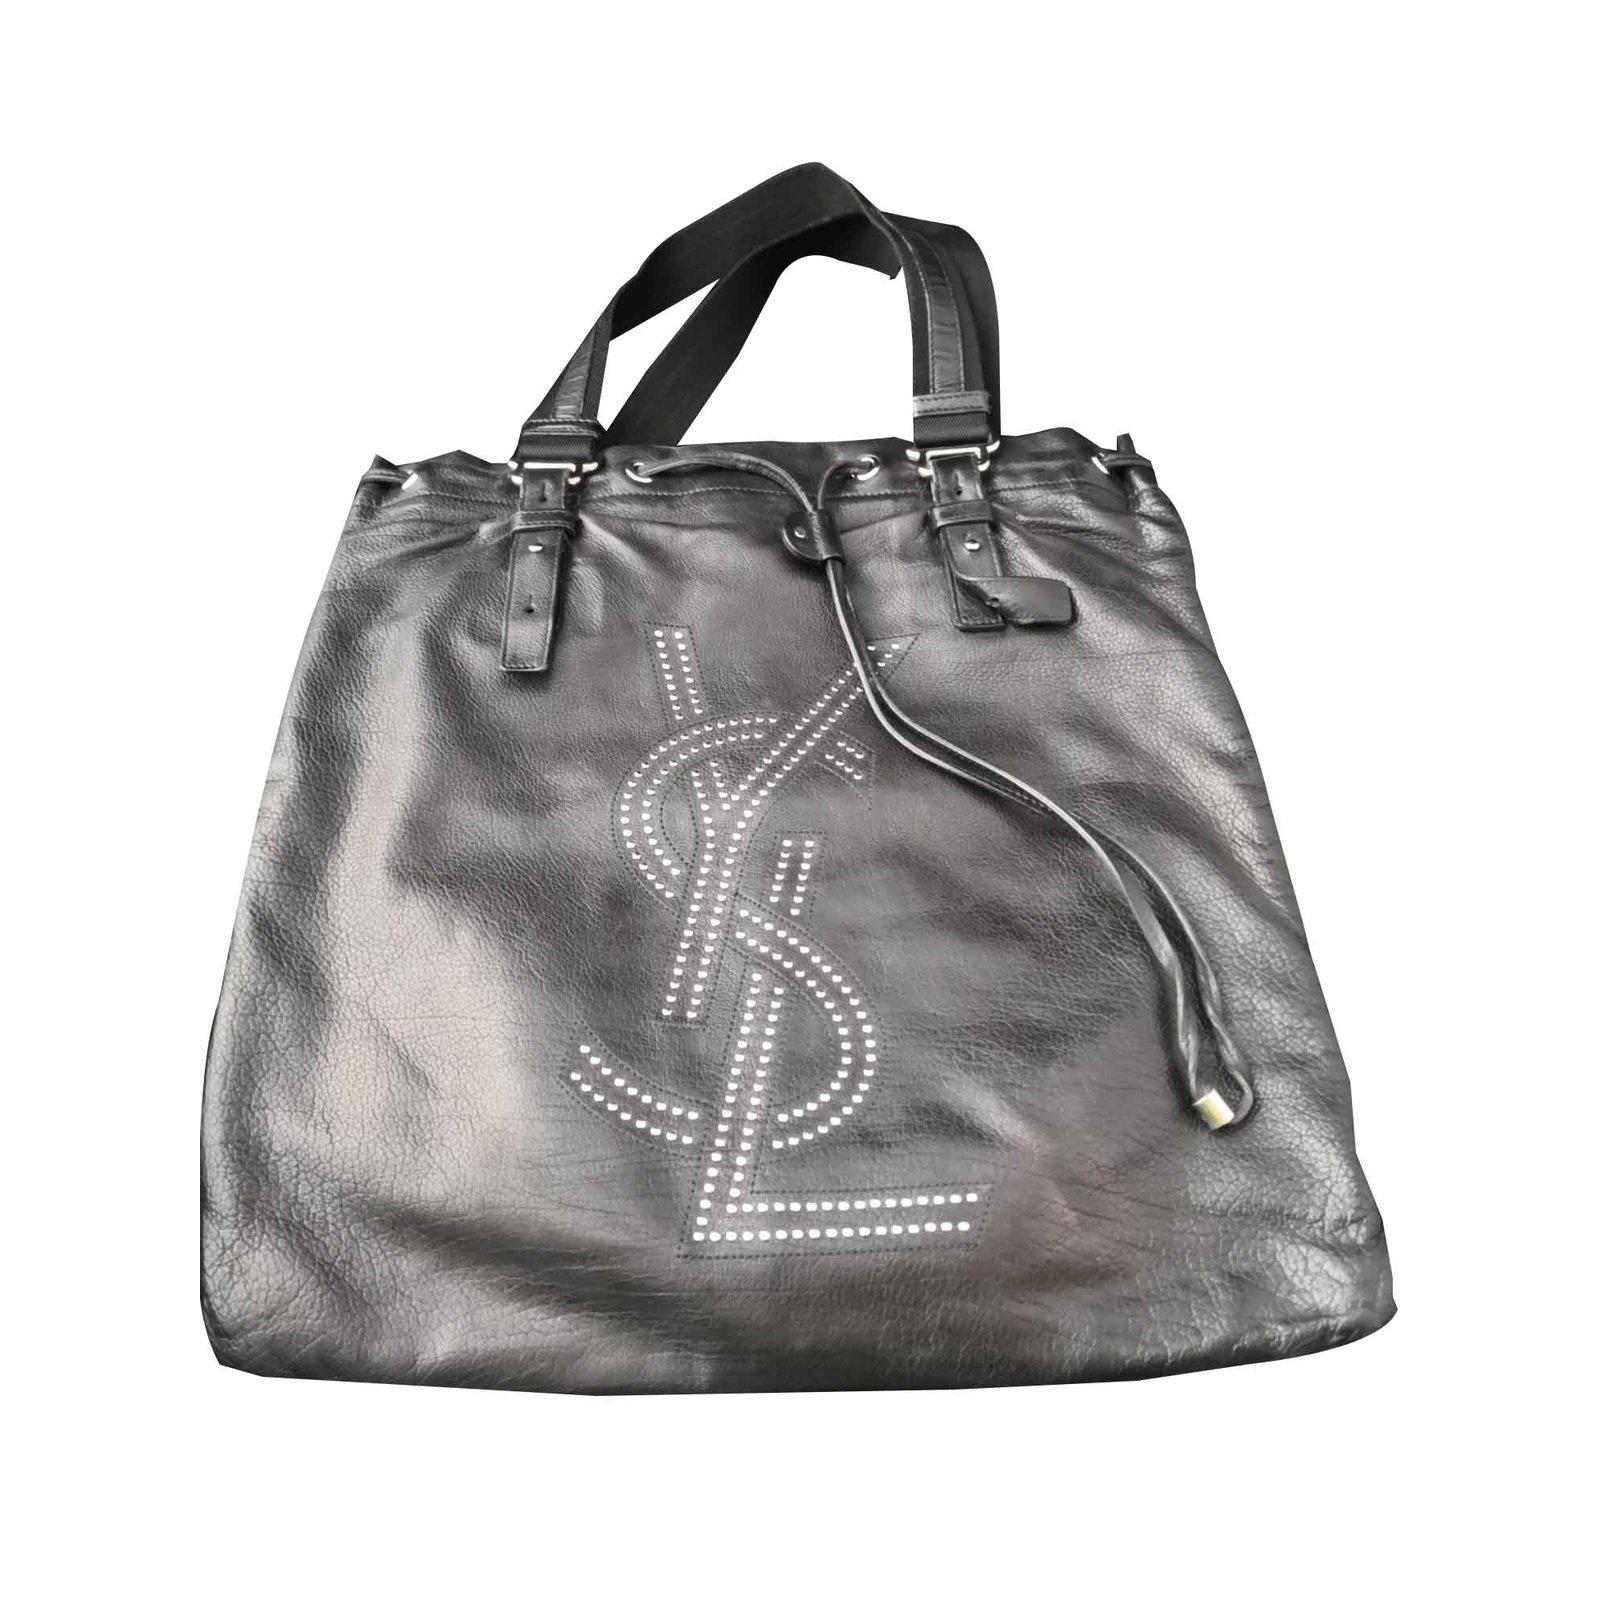 f85e2d6a6e Yves Saint Laurent Beautiful Yves Saint Laurent tote bag Handbags Lambskin  Black